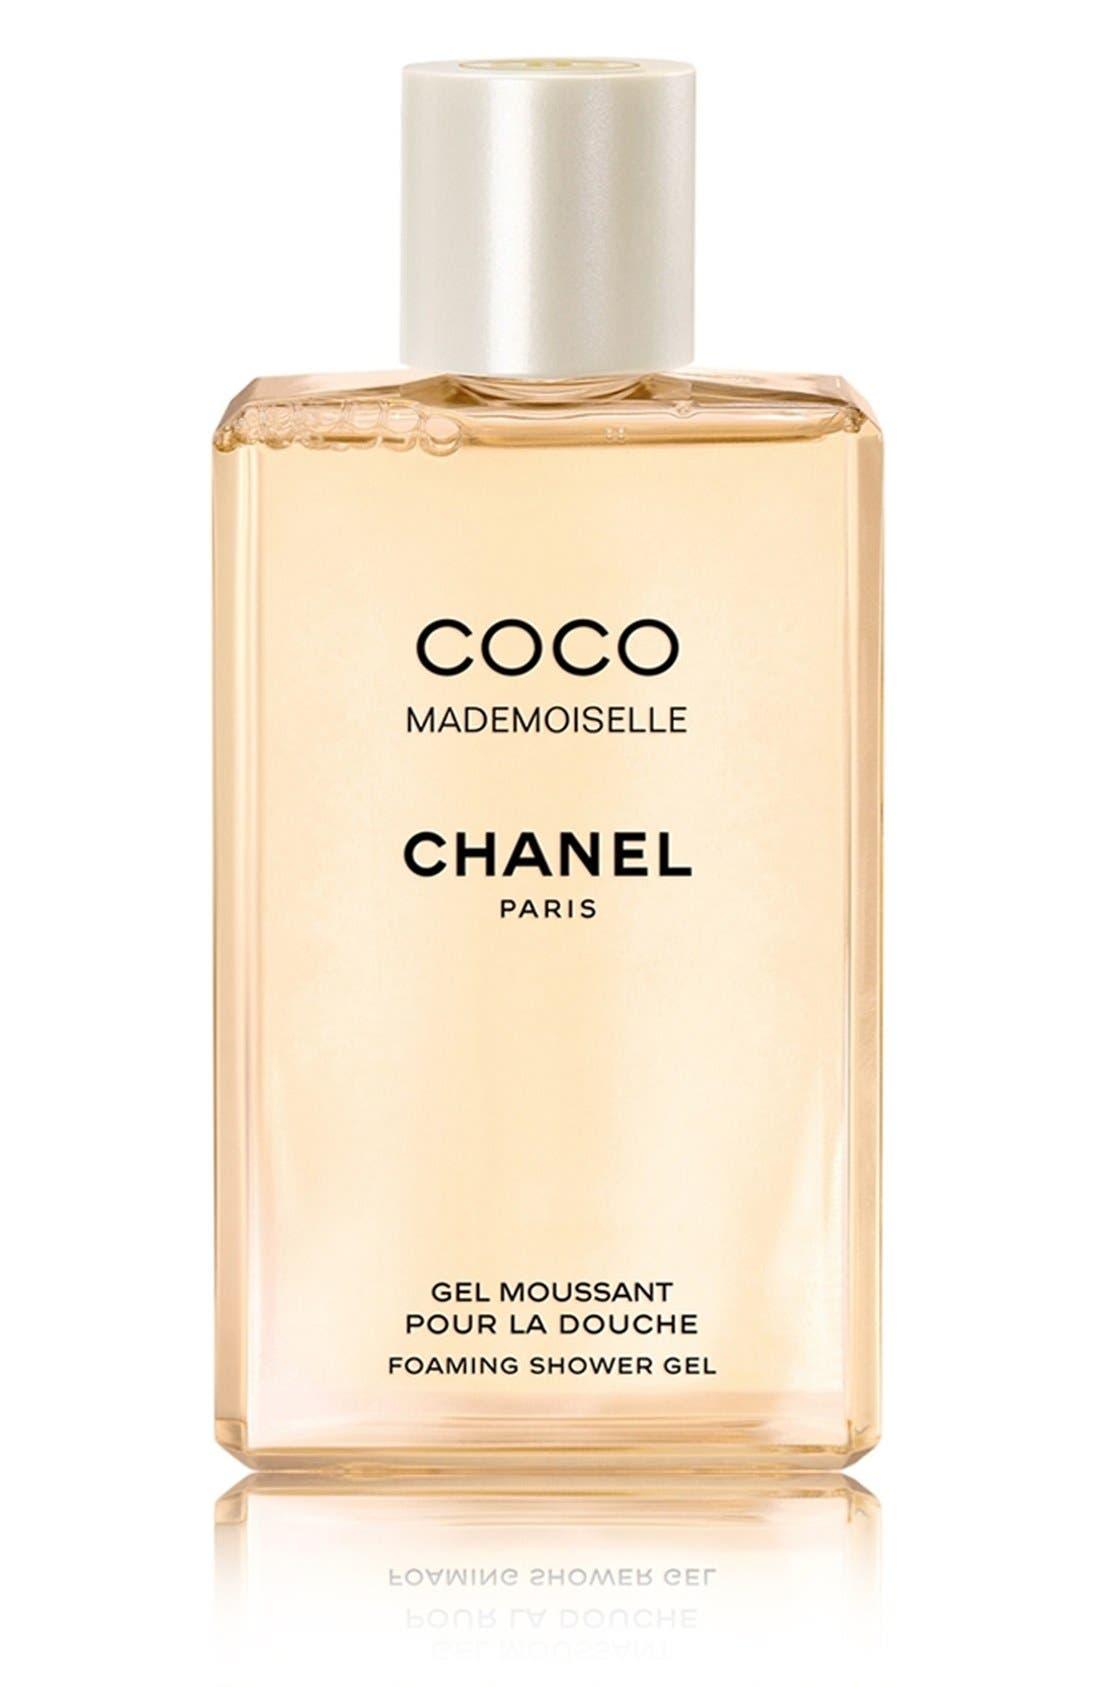 CHANEL COCO MADEMOISELLE<br />Foaming Shower Gel, Main, color, NO COLOR